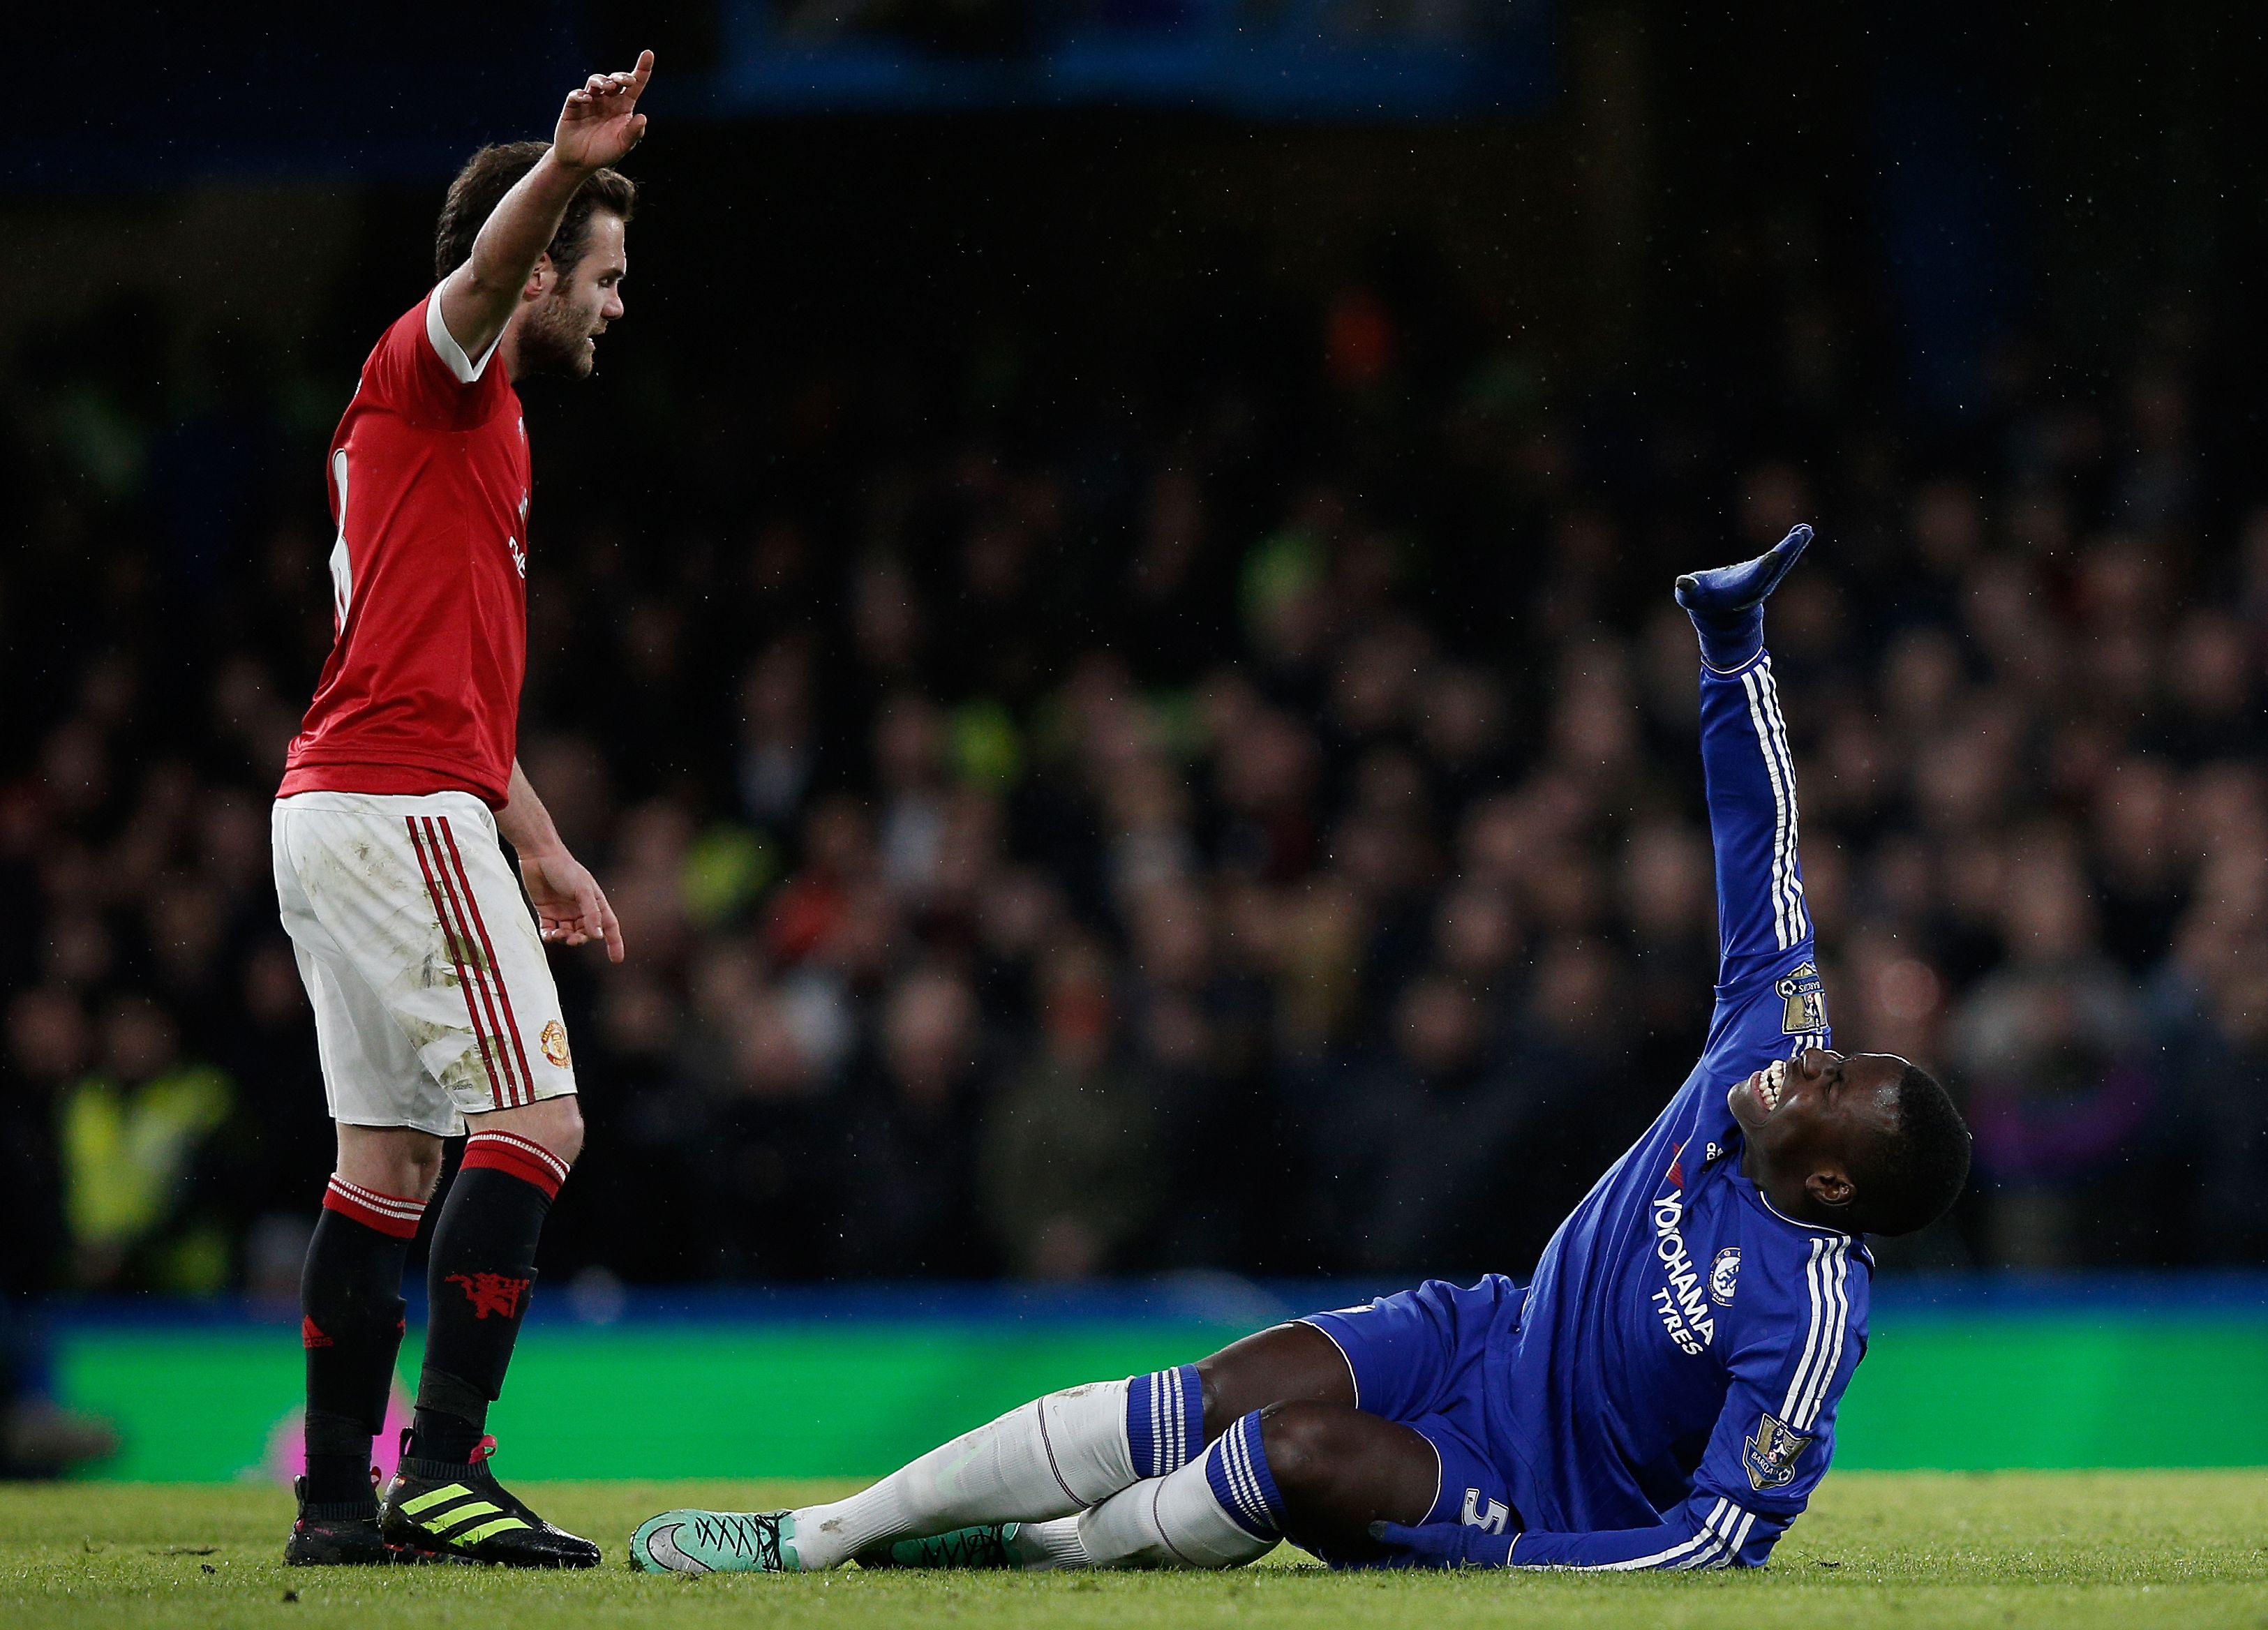 Chelsea injury news: Season over for Kurt Zouma? Samba star Pato not ready just yet, Loic Remy return